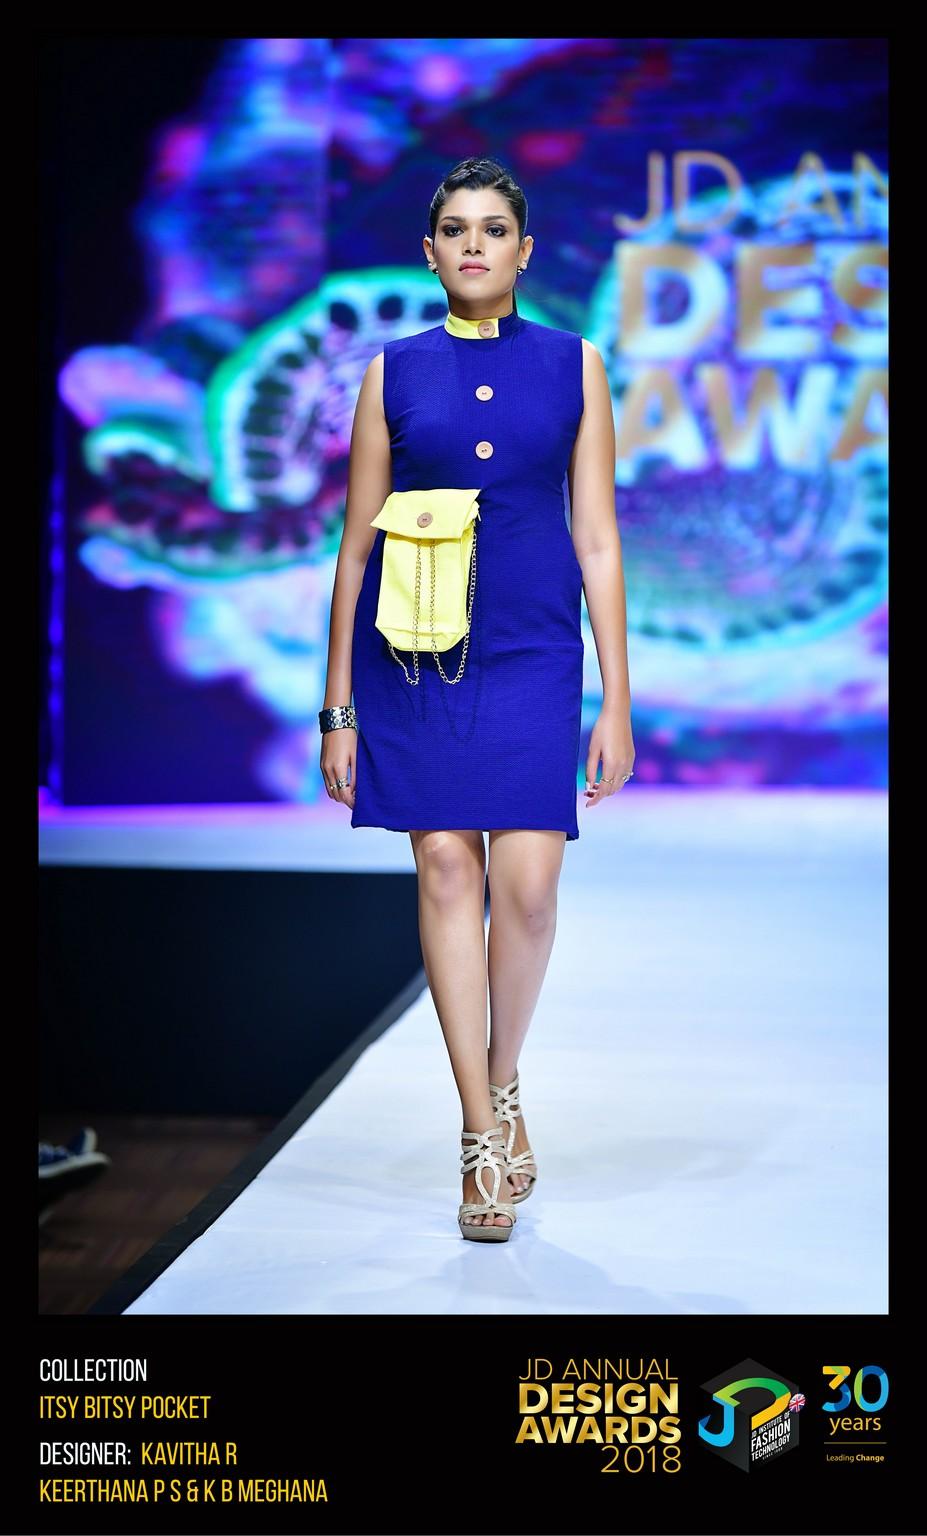 Itsy Bitsy Pocket Dress – Change – JD Annual Design Awards 2018   Designer: Kavitha, Keertana and Meghana   Photography : Jerin Nath (@jerin_nath) itsy bitsy pocket dress - ITSY BITSY POCKET5 - Itsy Bitsy Pocket Dress – Change – JD Annual Design Awards 2018